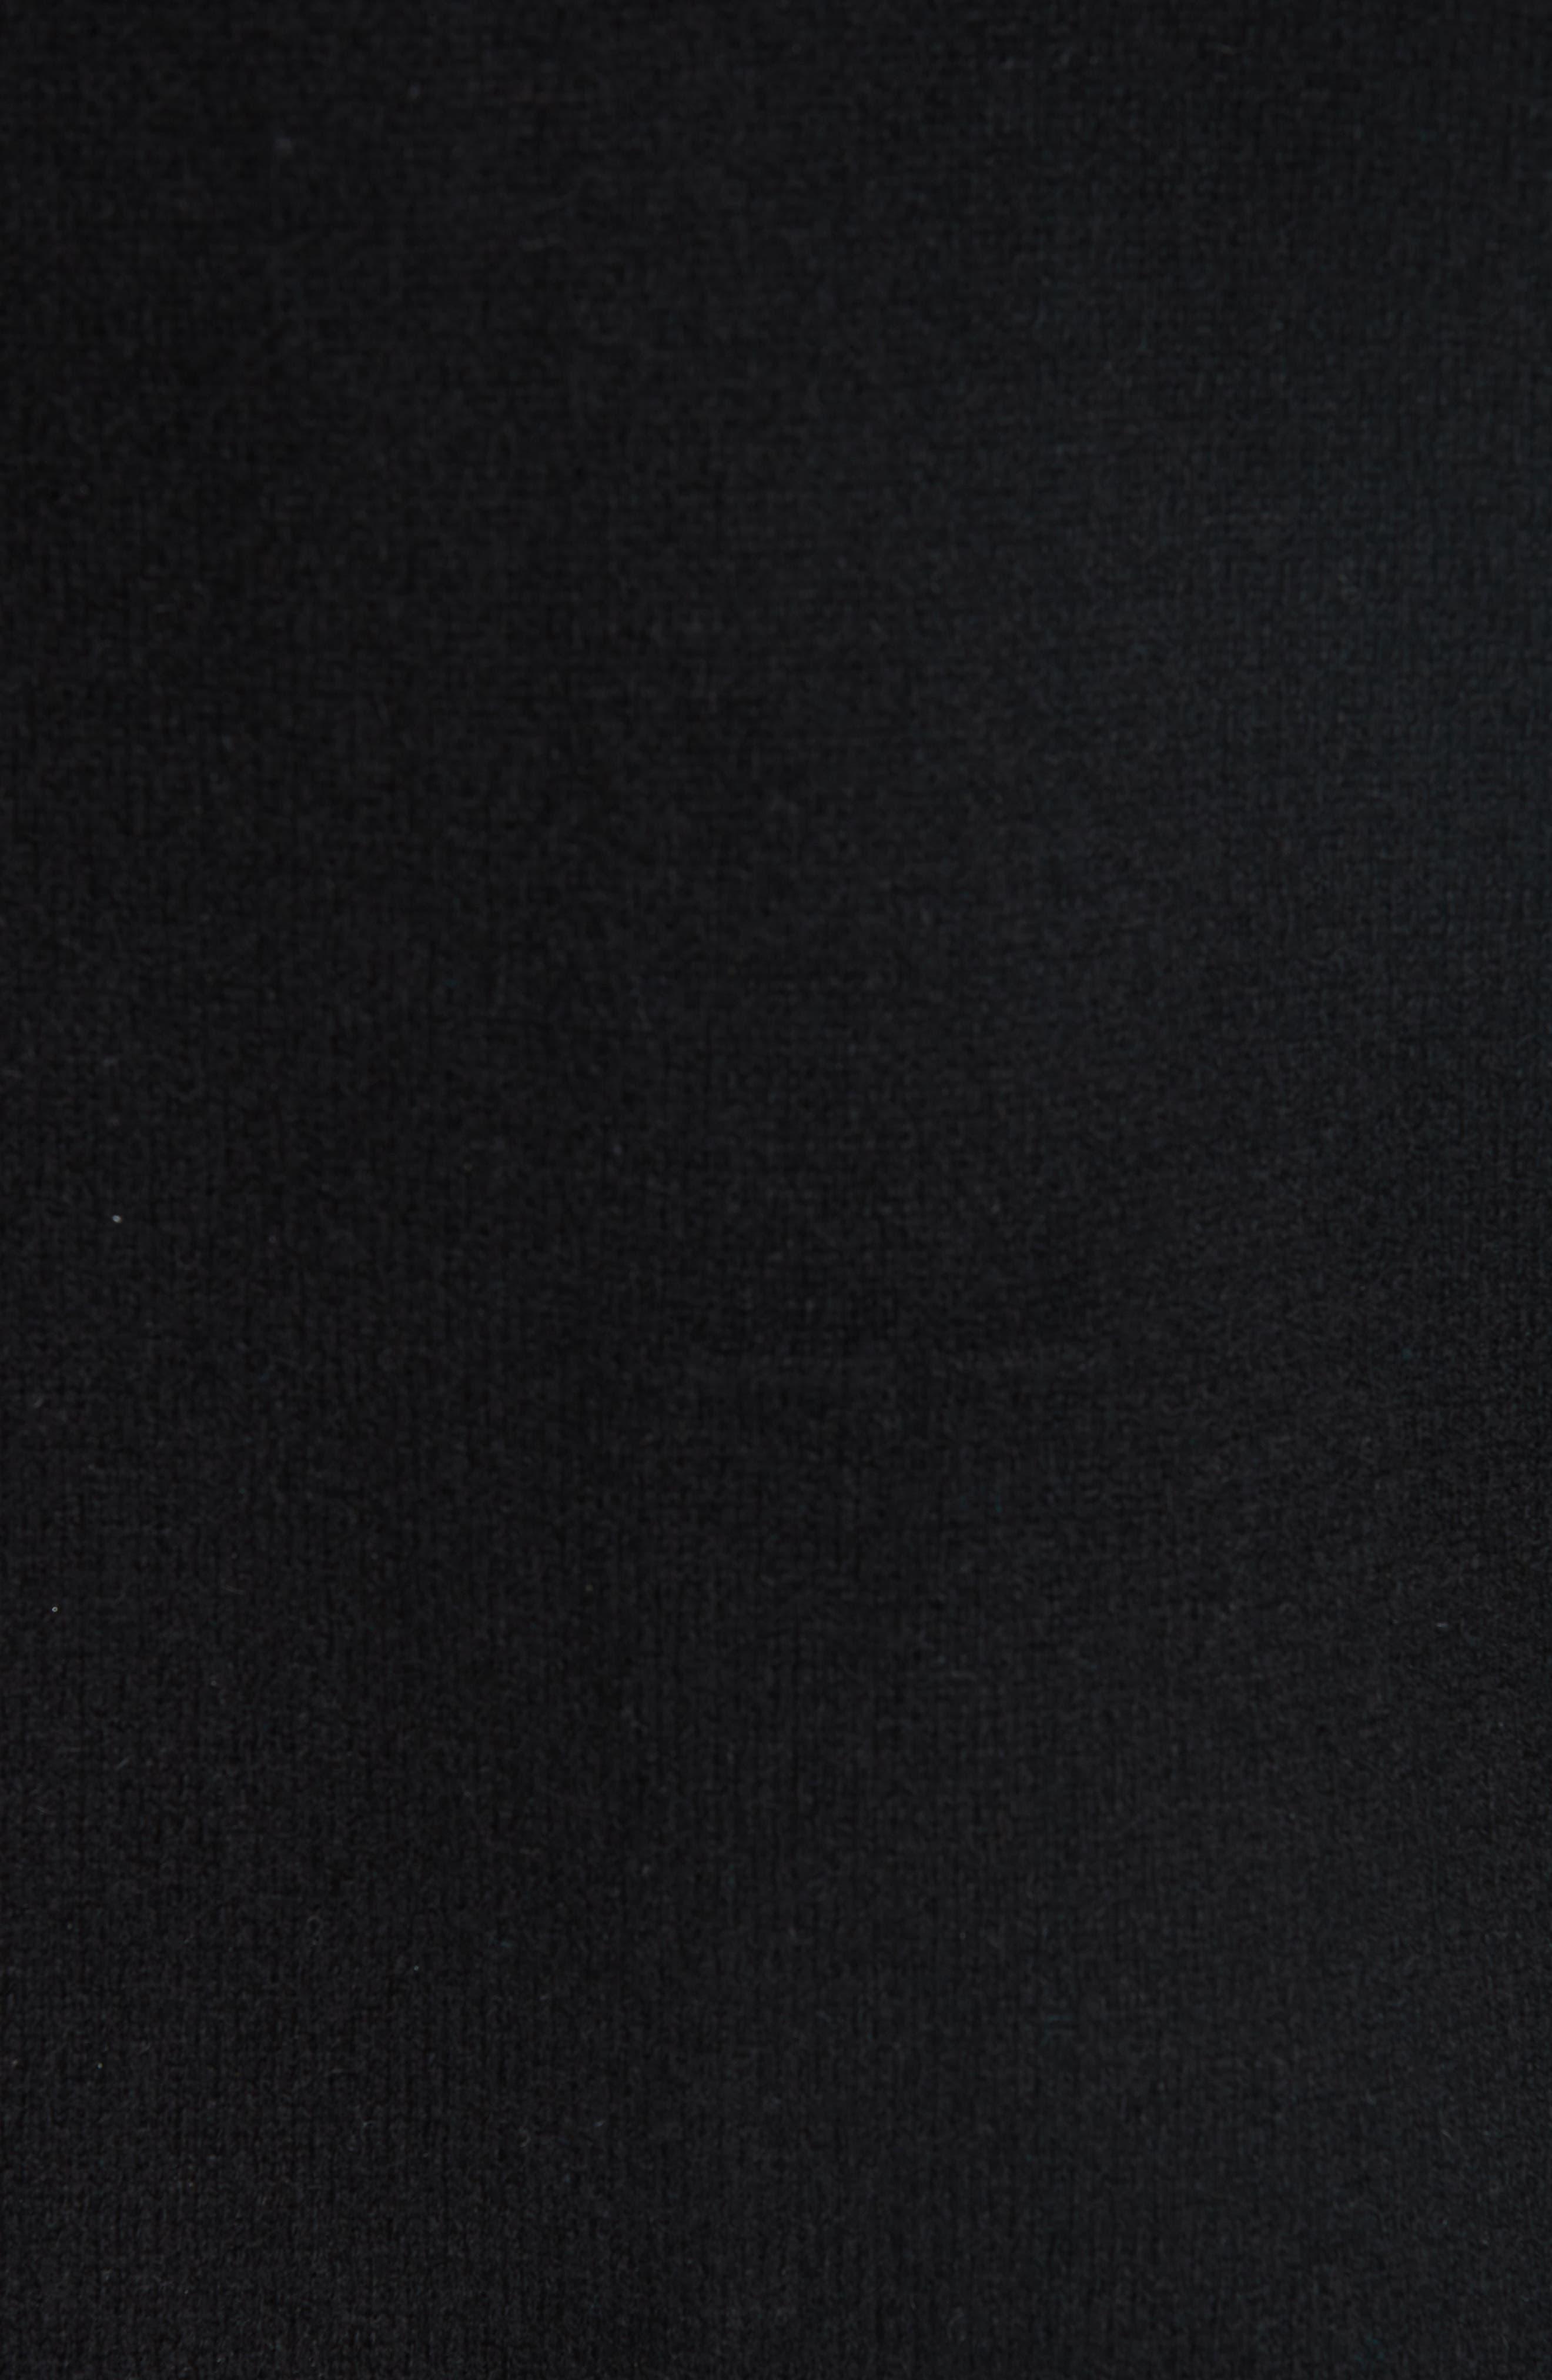 Crystal Drawstring Cashmere Blend Hoodie,                             Alternate thumbnail 6, color,                             BLACK